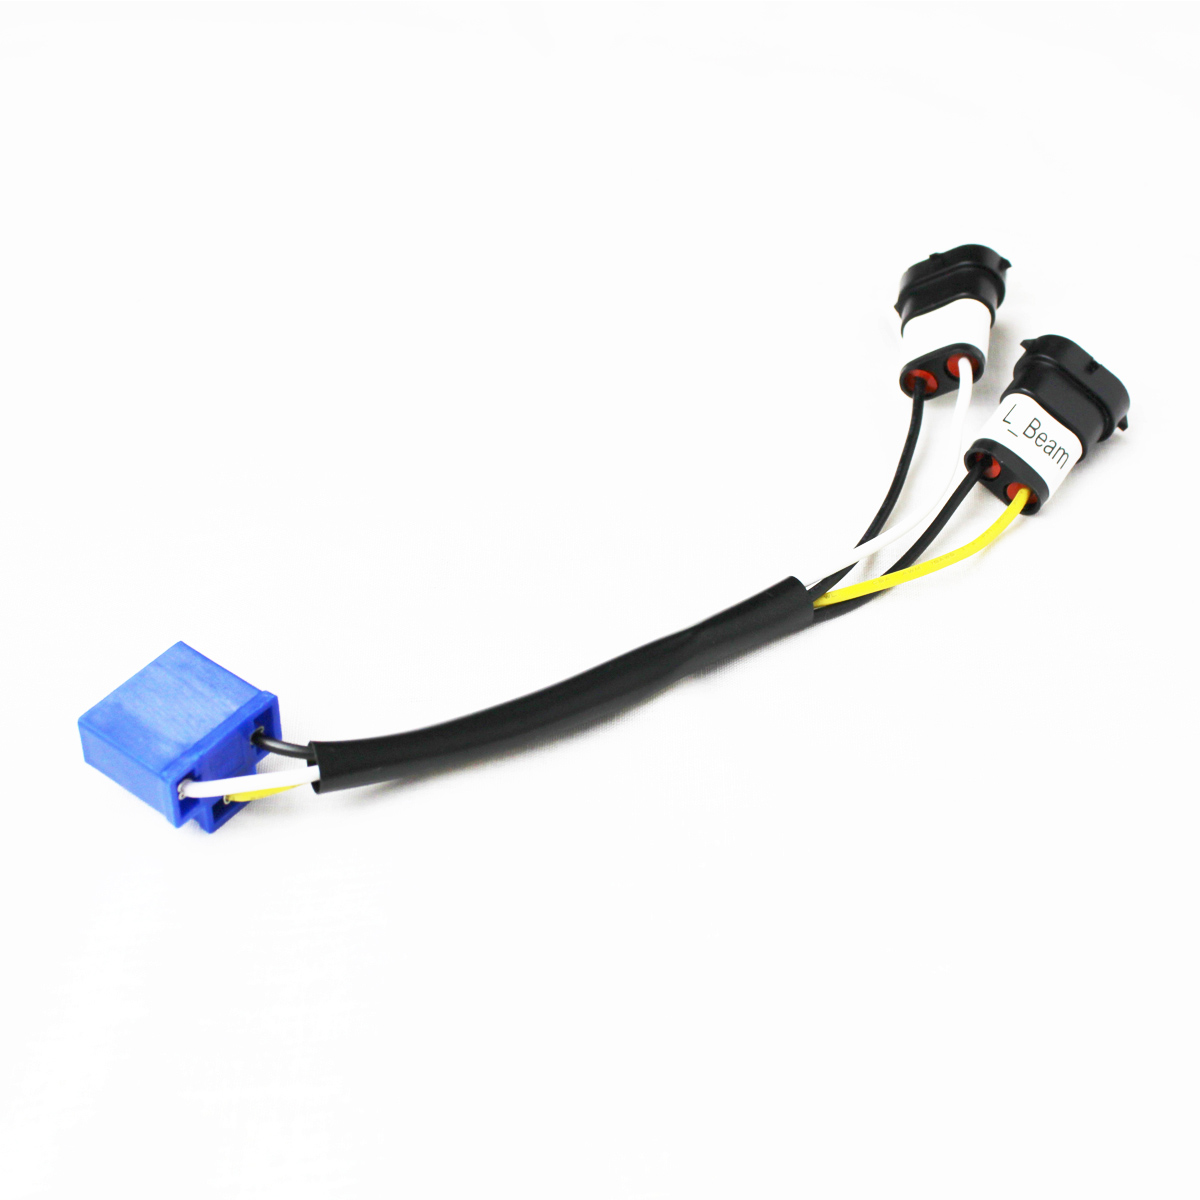 hight resolution of hogworkz led headlight wire harness adapter